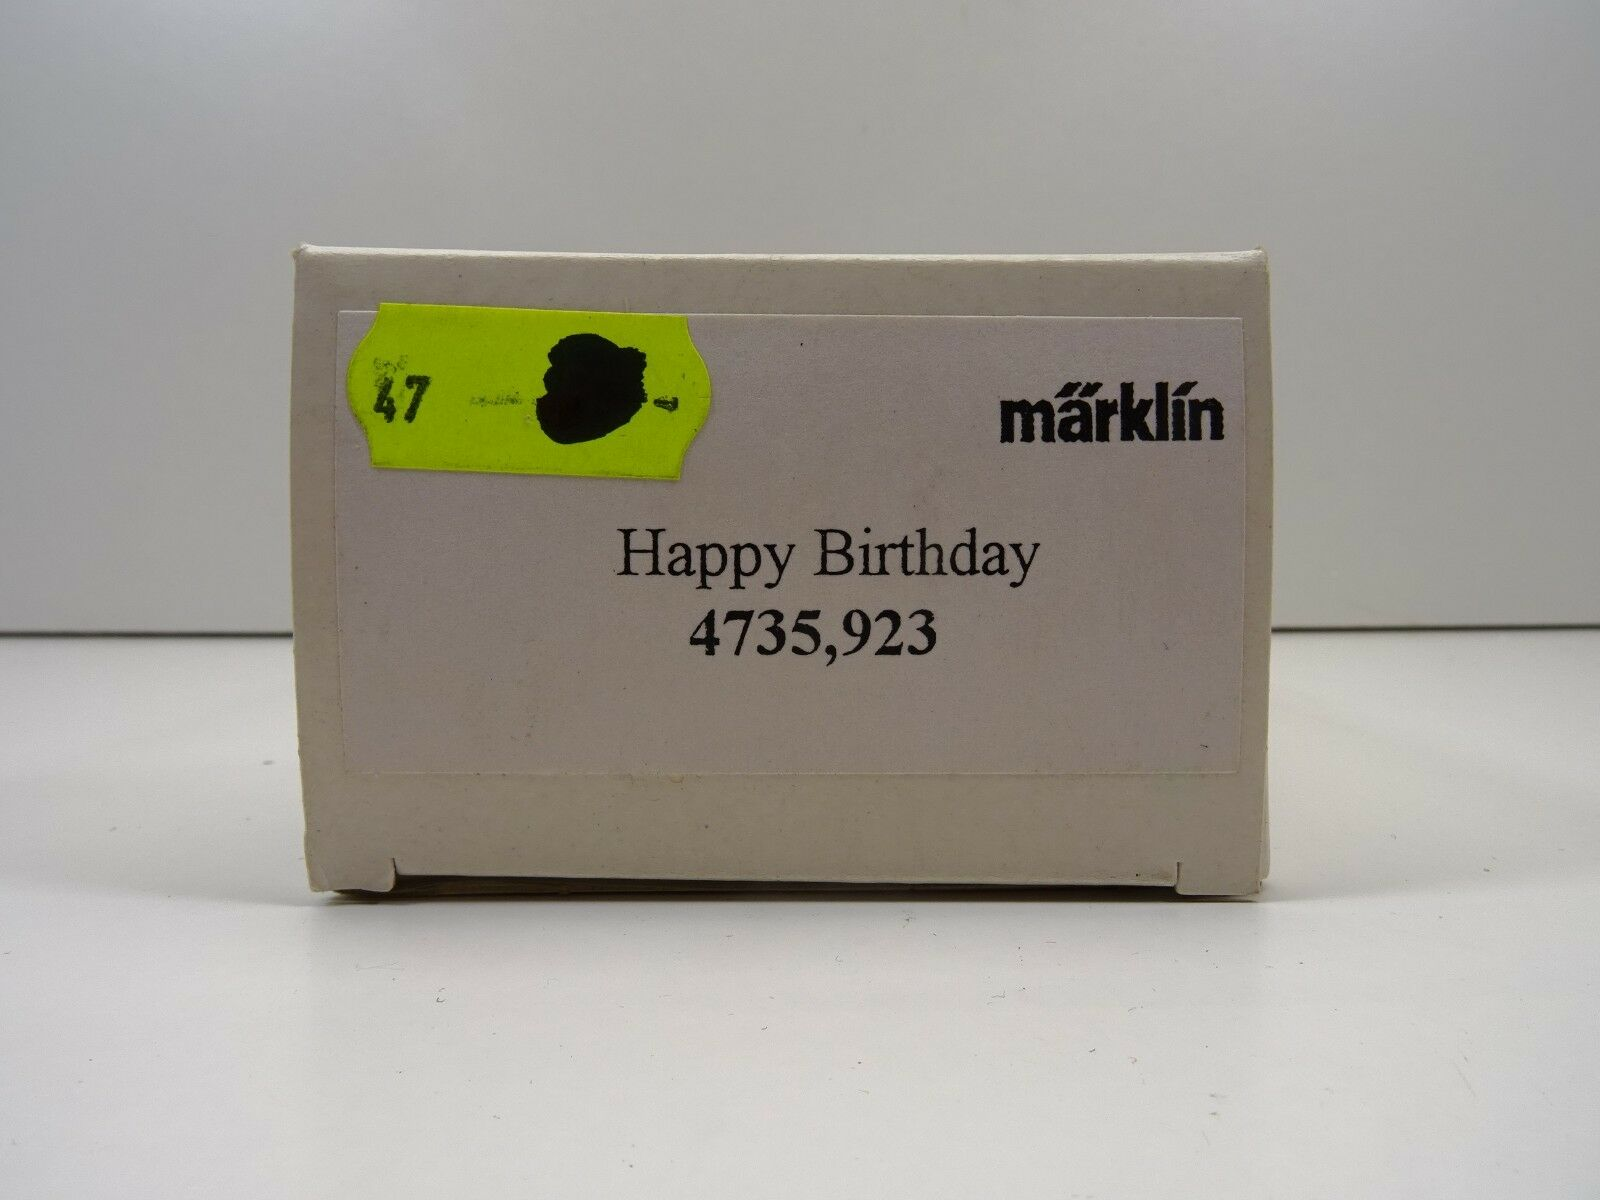 Märklin h0 4735,923 Sowa Happy Birthday Birthday Birthday hbils Top Scatola Originale c3378 2e517e